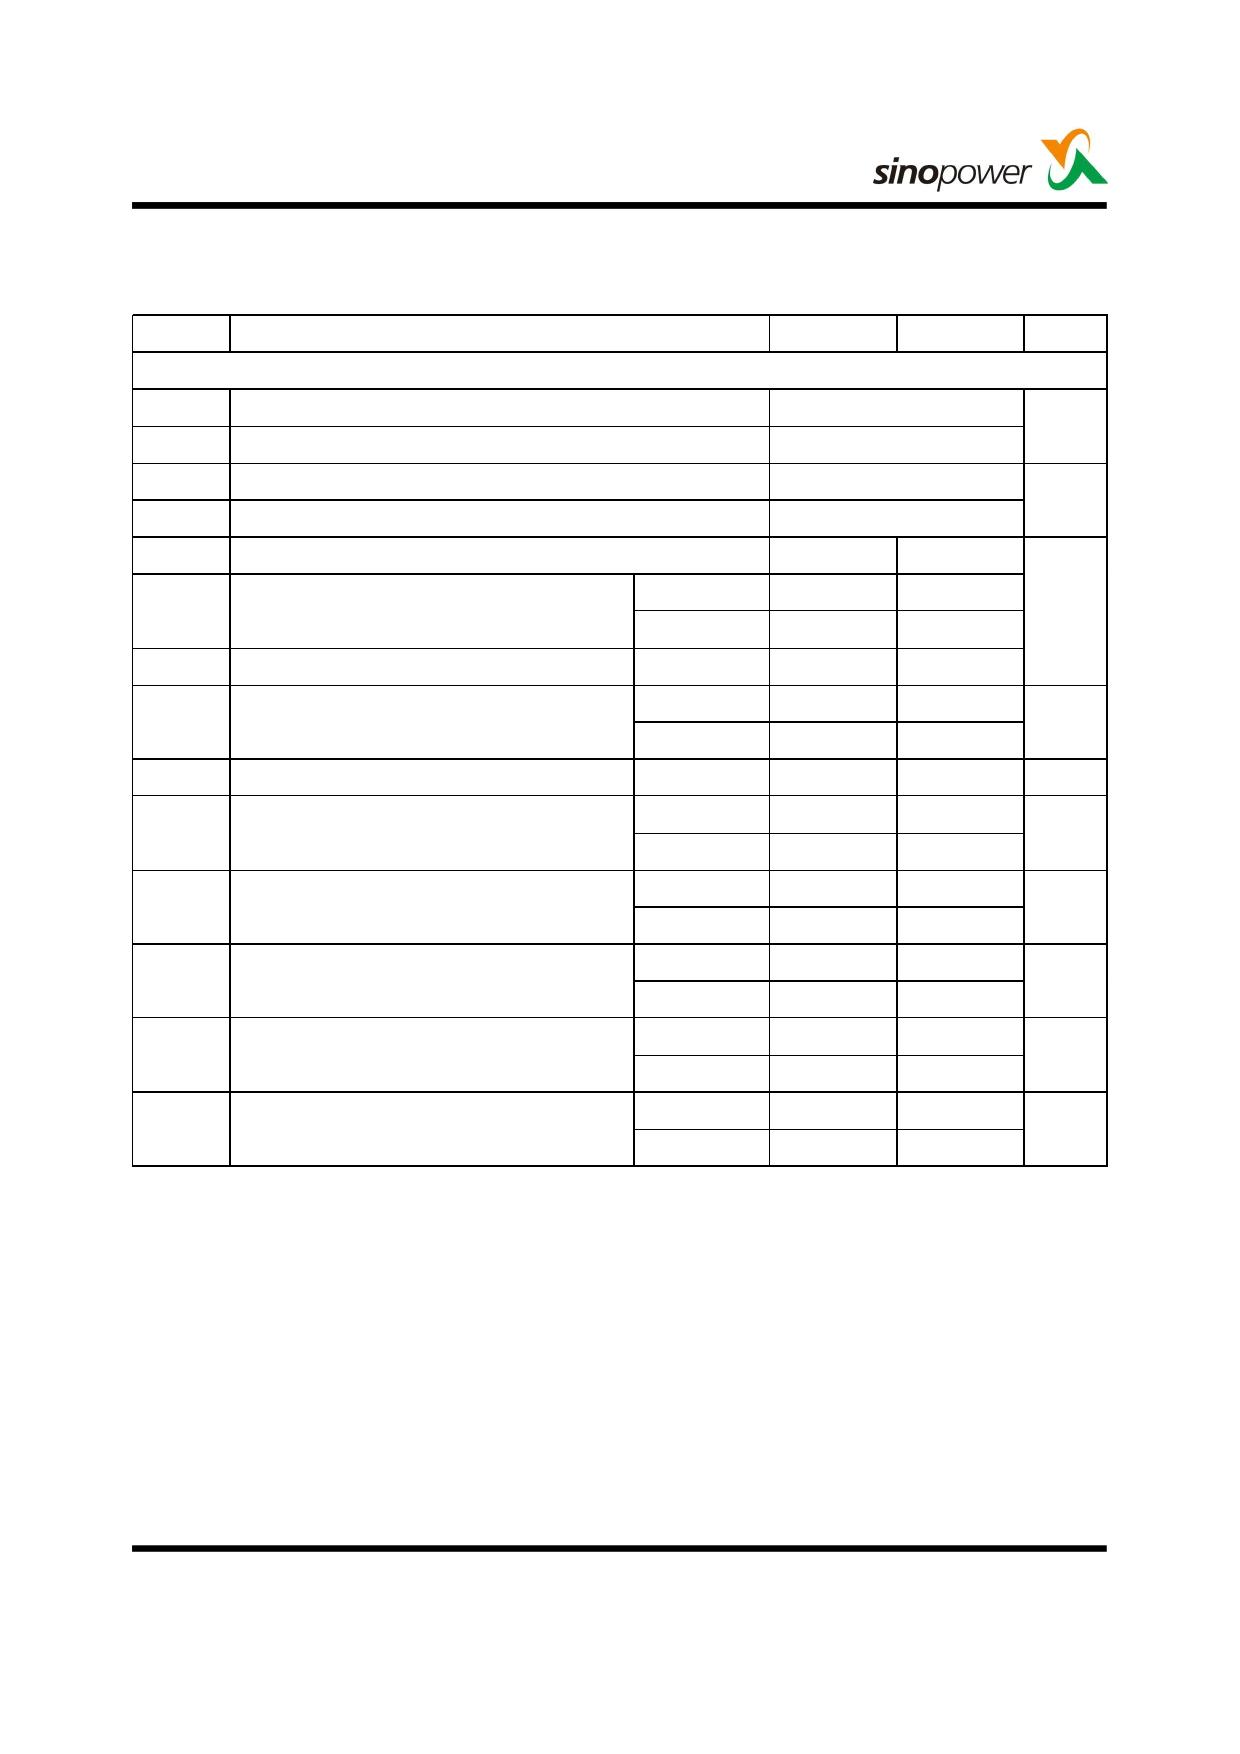 SM7321ESKP pdf, schematic